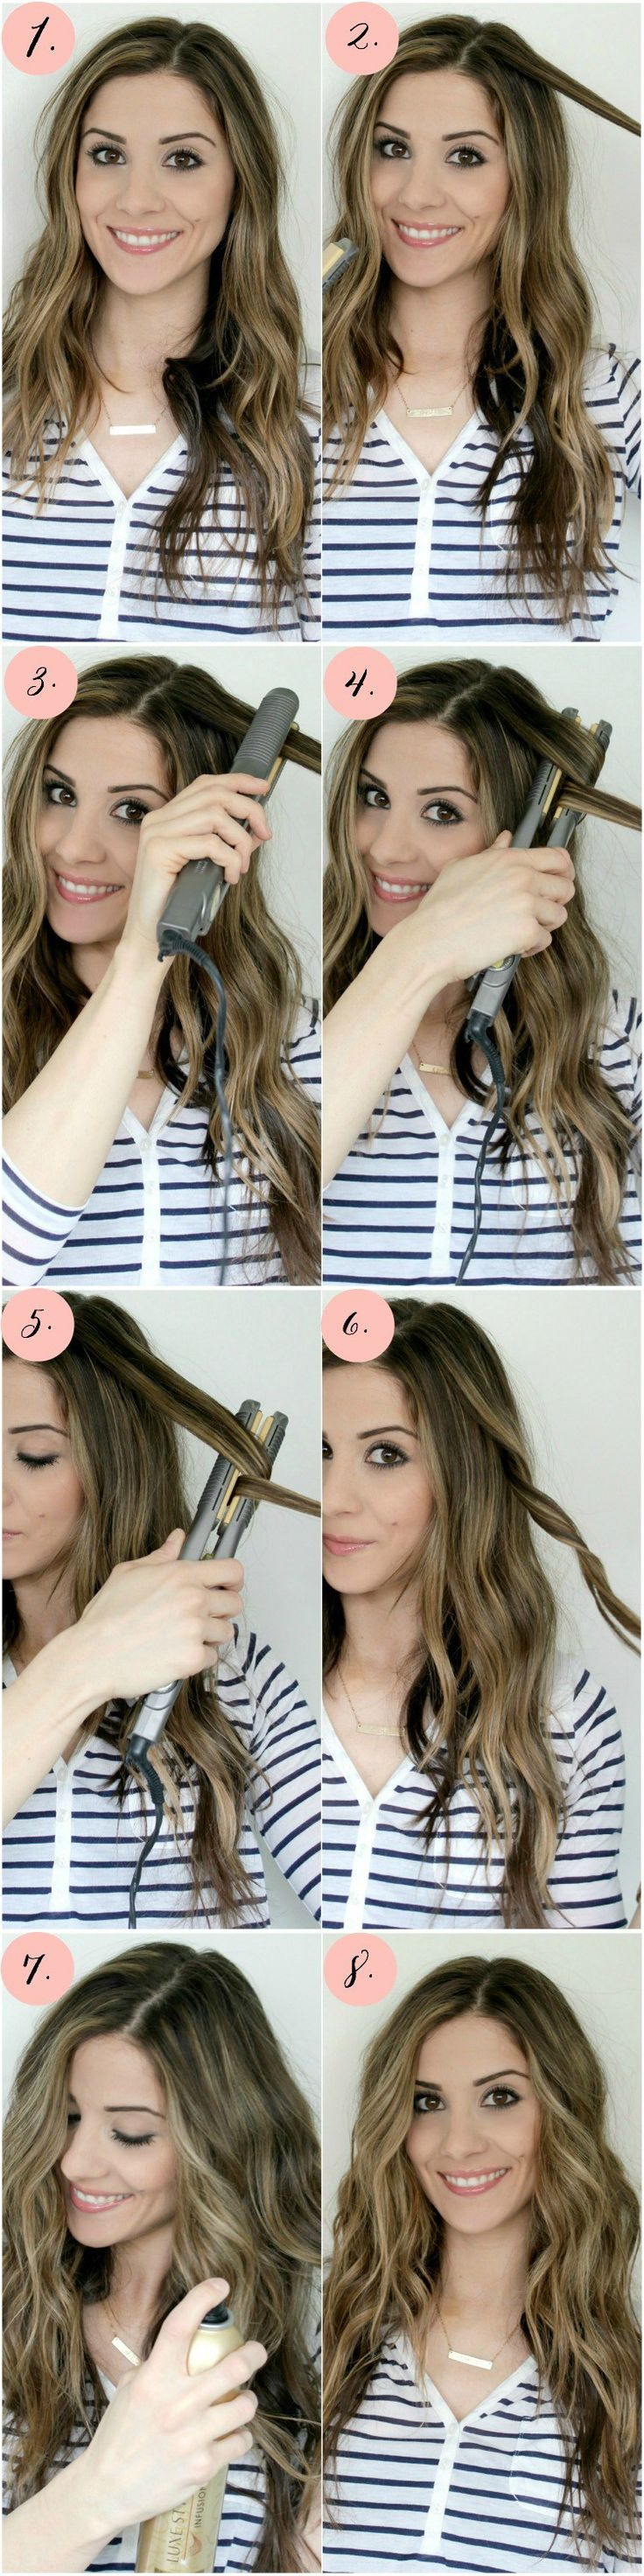 38 best hair styles images on Pinterest